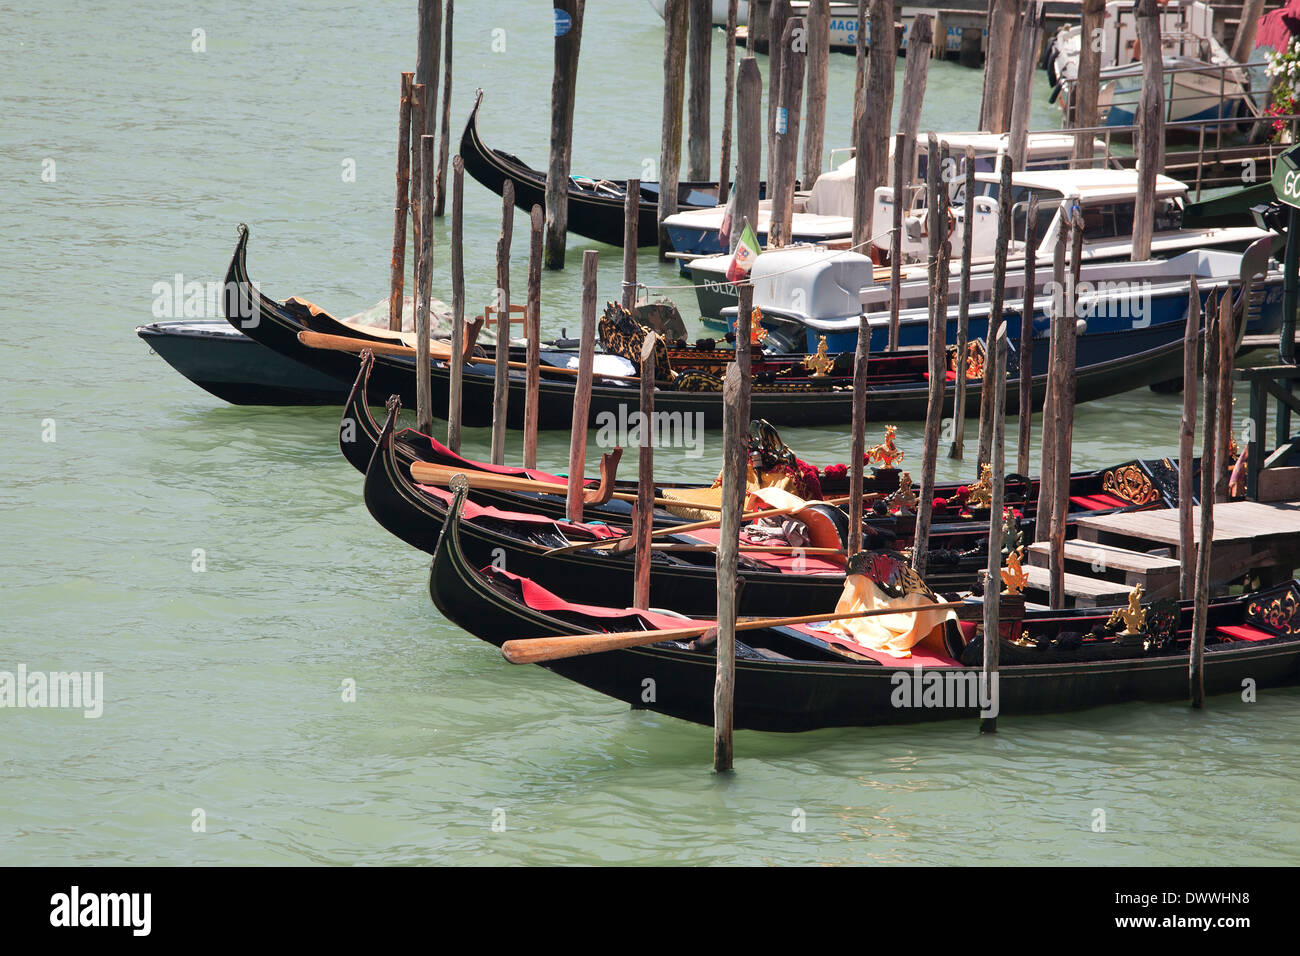 Venice - gondolas on Grand Canal - Stock Image